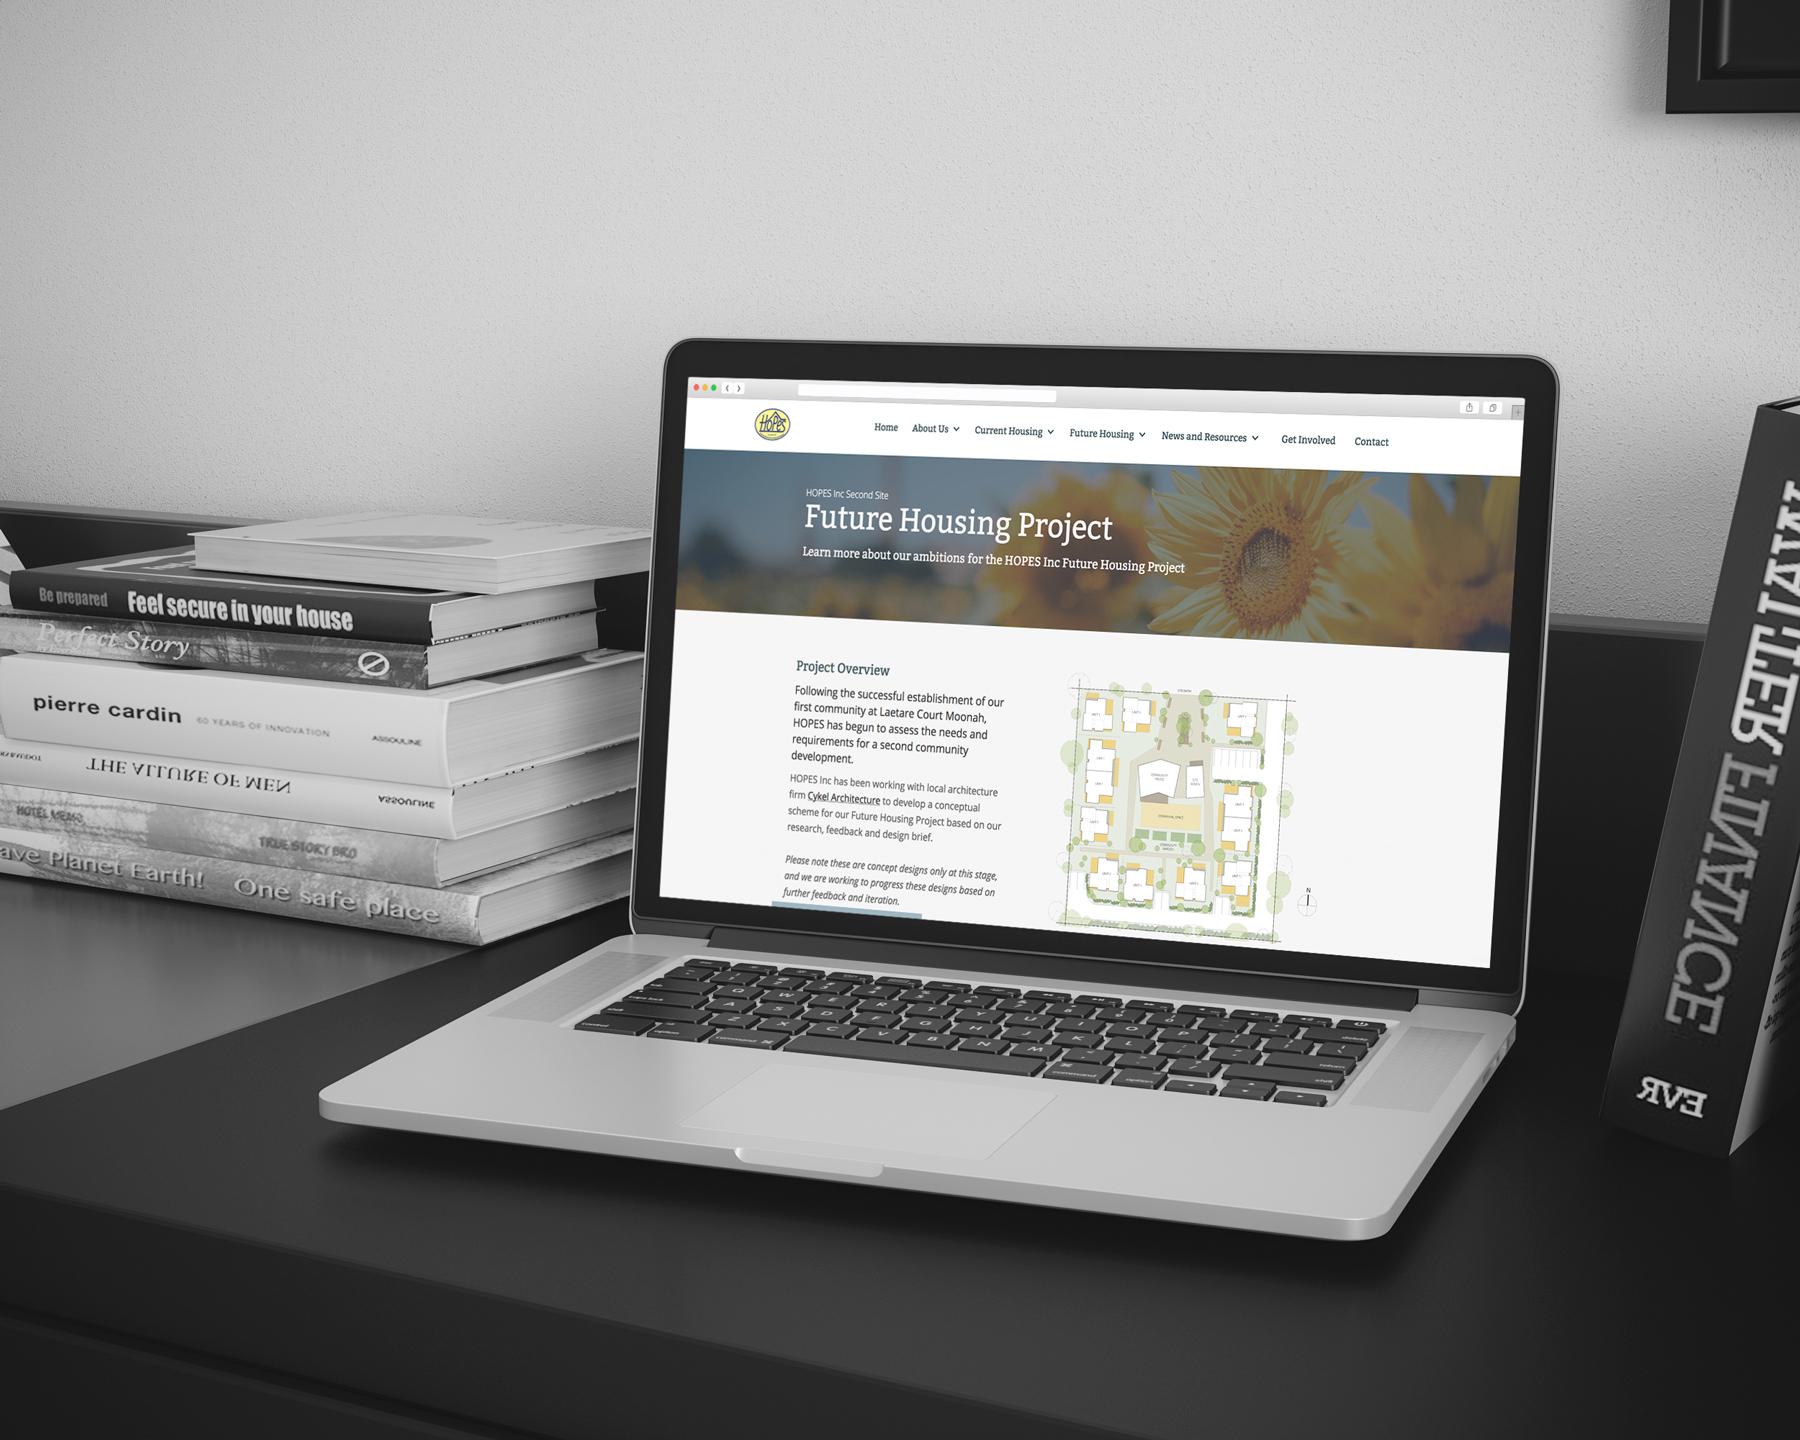 Promote the sense of community through website design